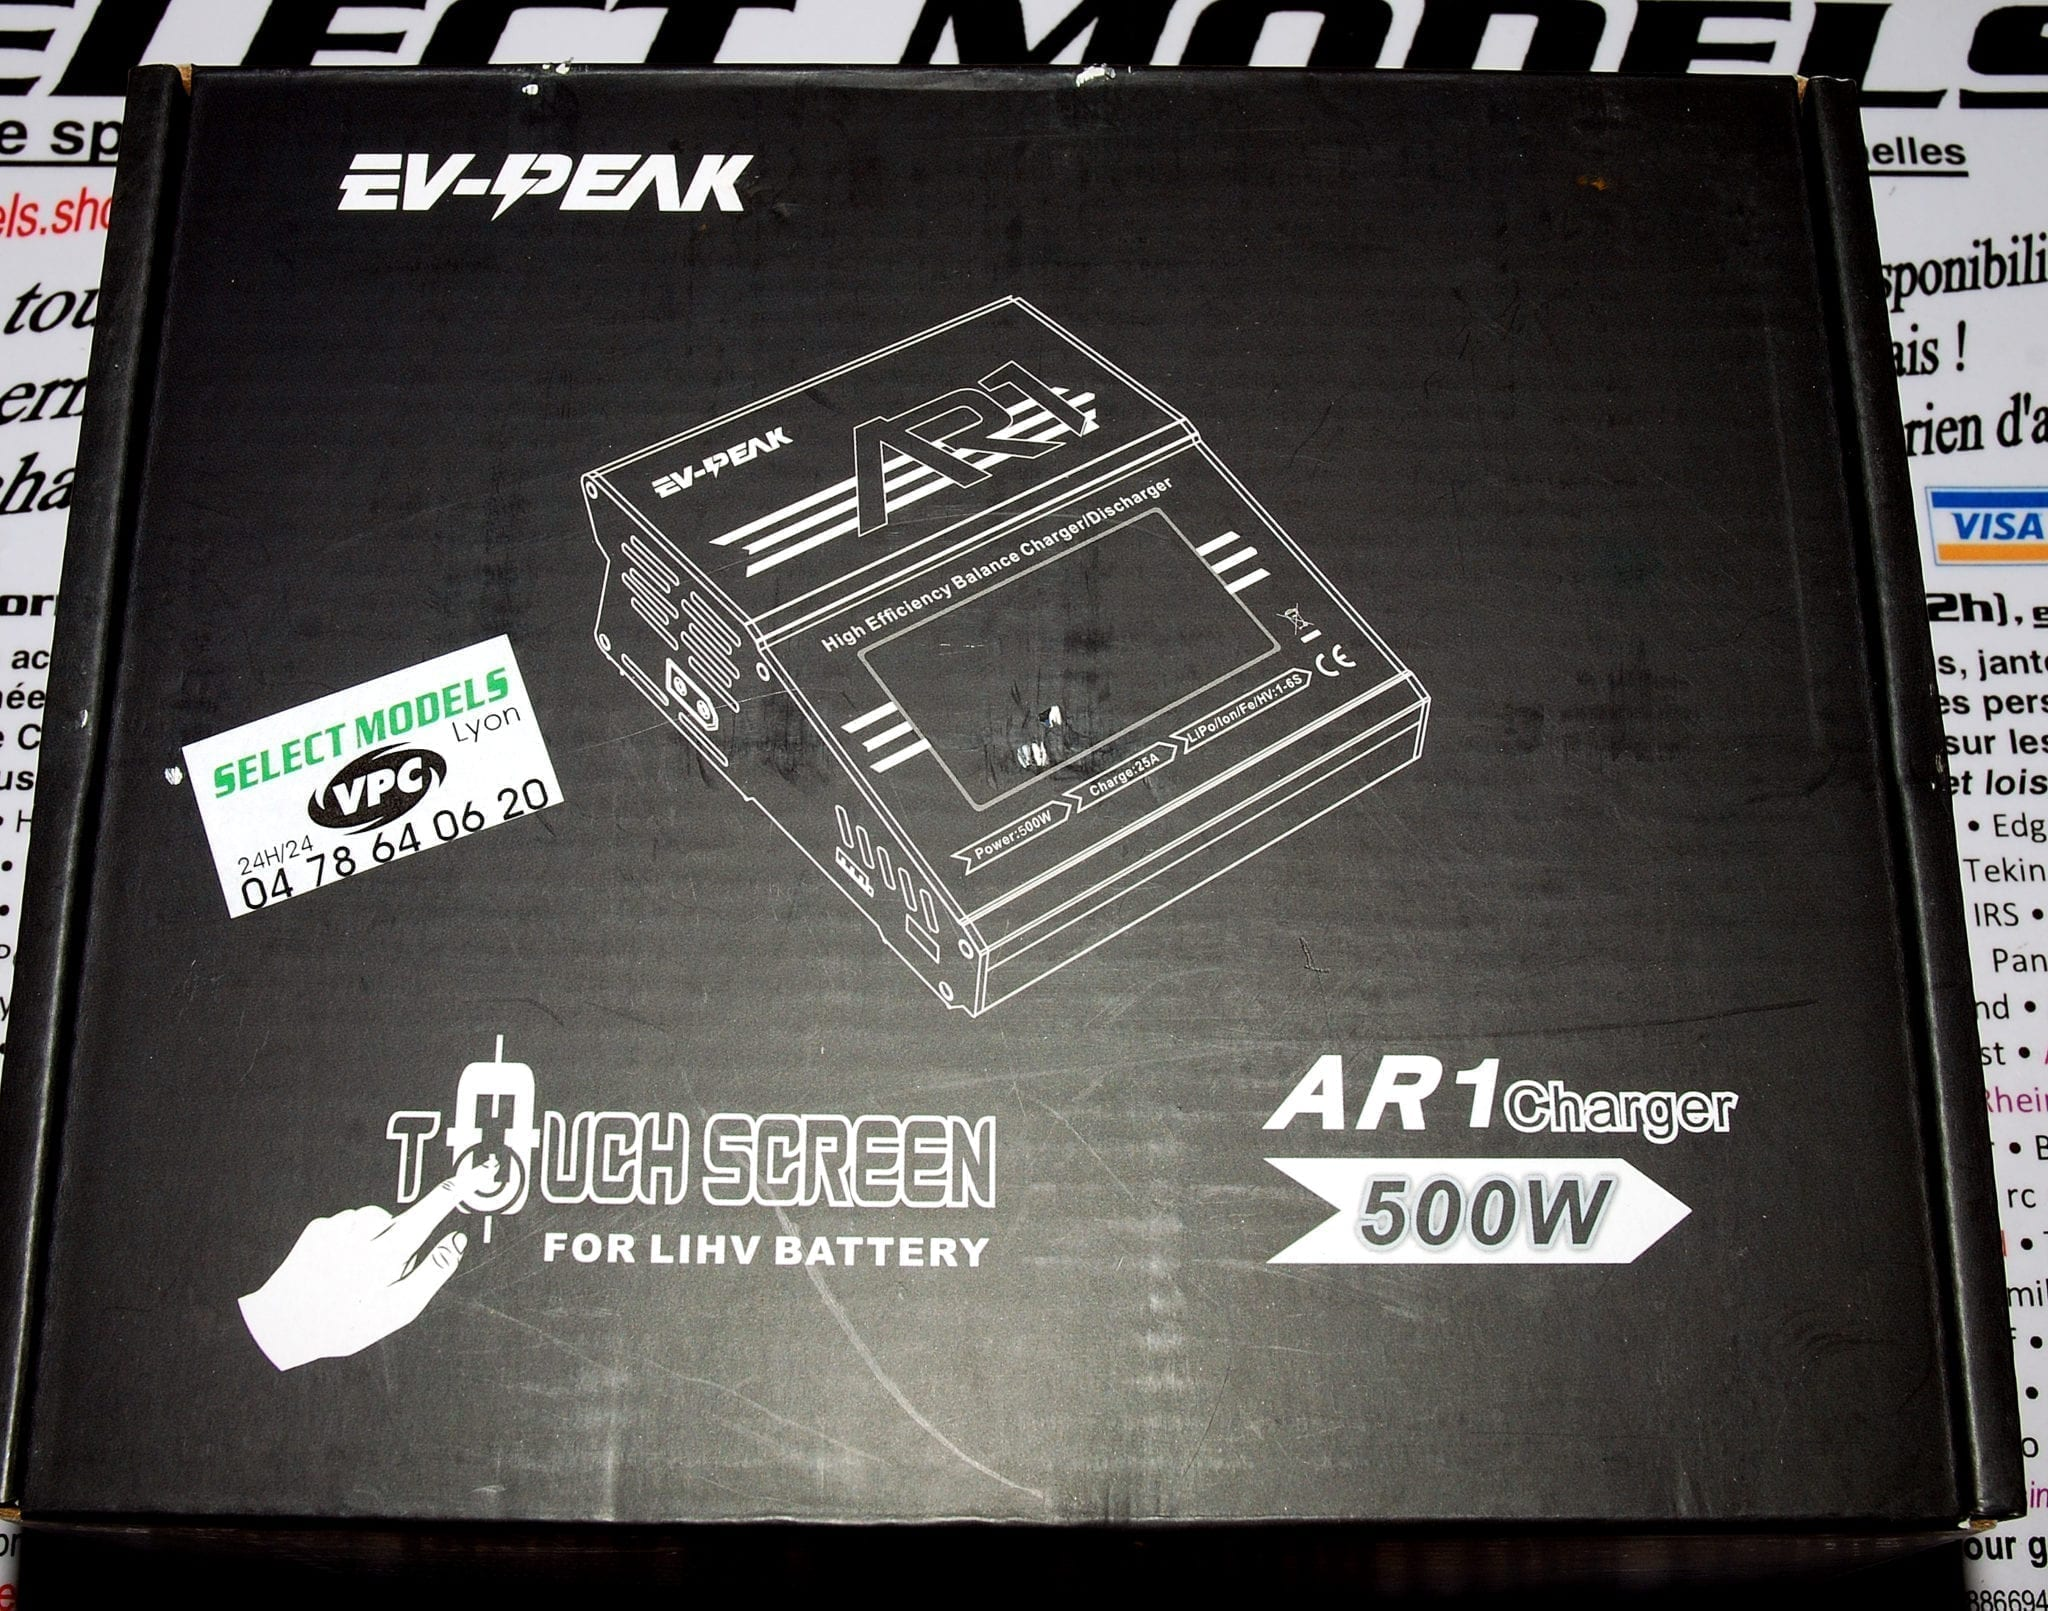 Chargeur AR1 noir EV-PEAK